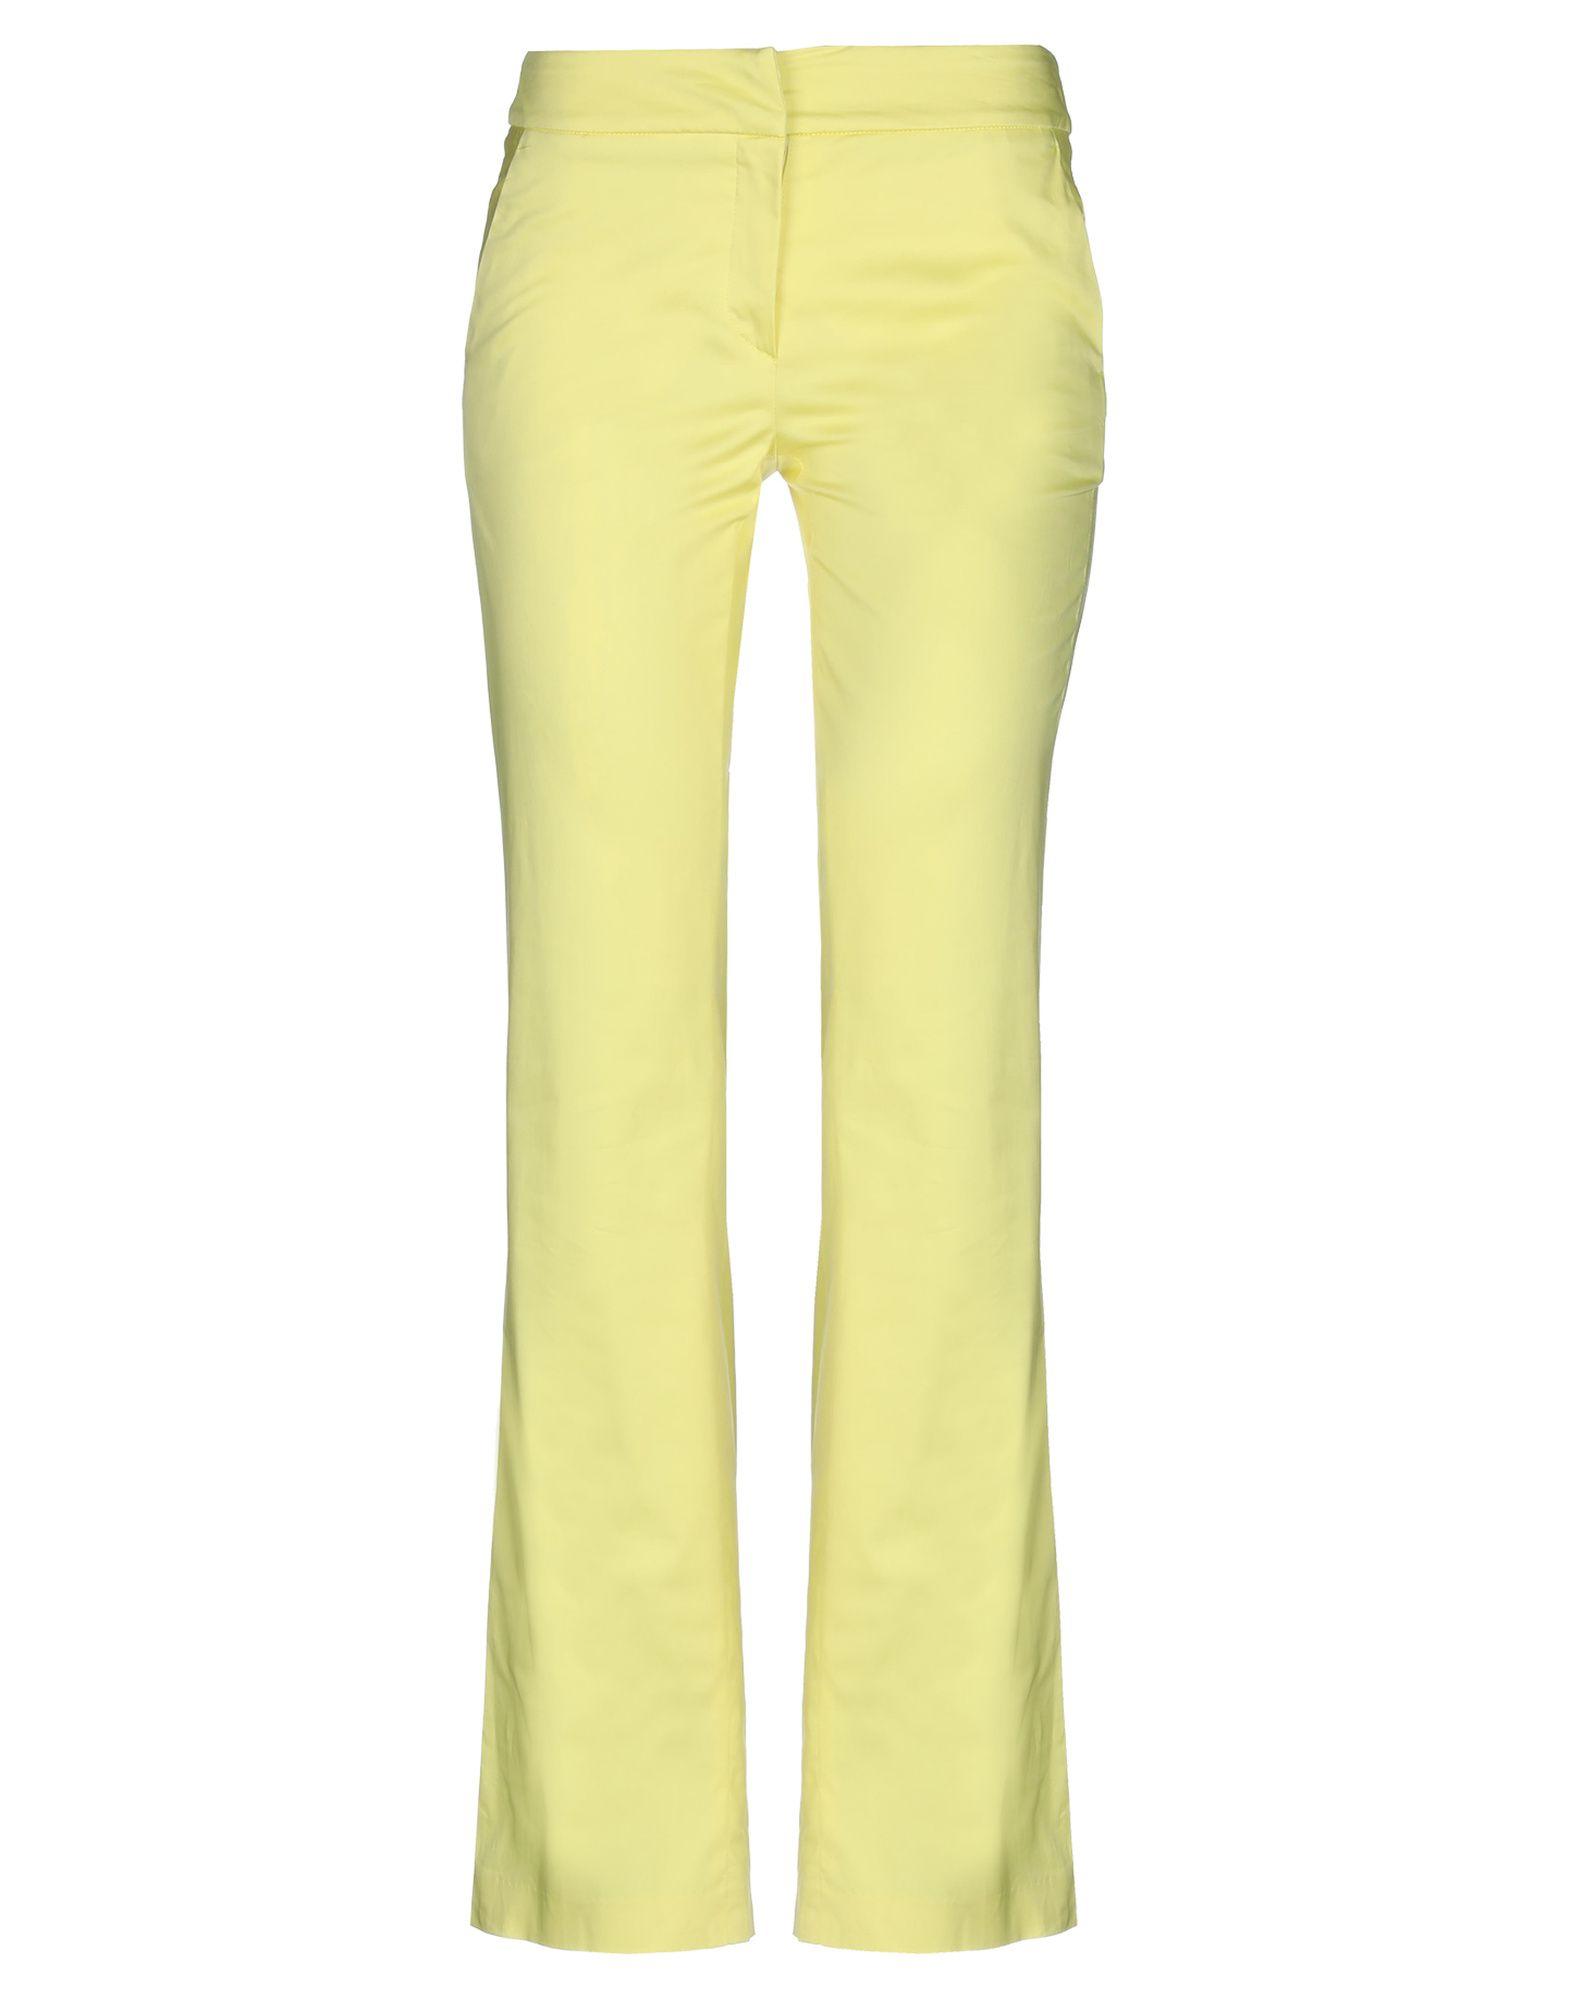 SWISH JEANS Повседневные брюки swish jeans пиджак